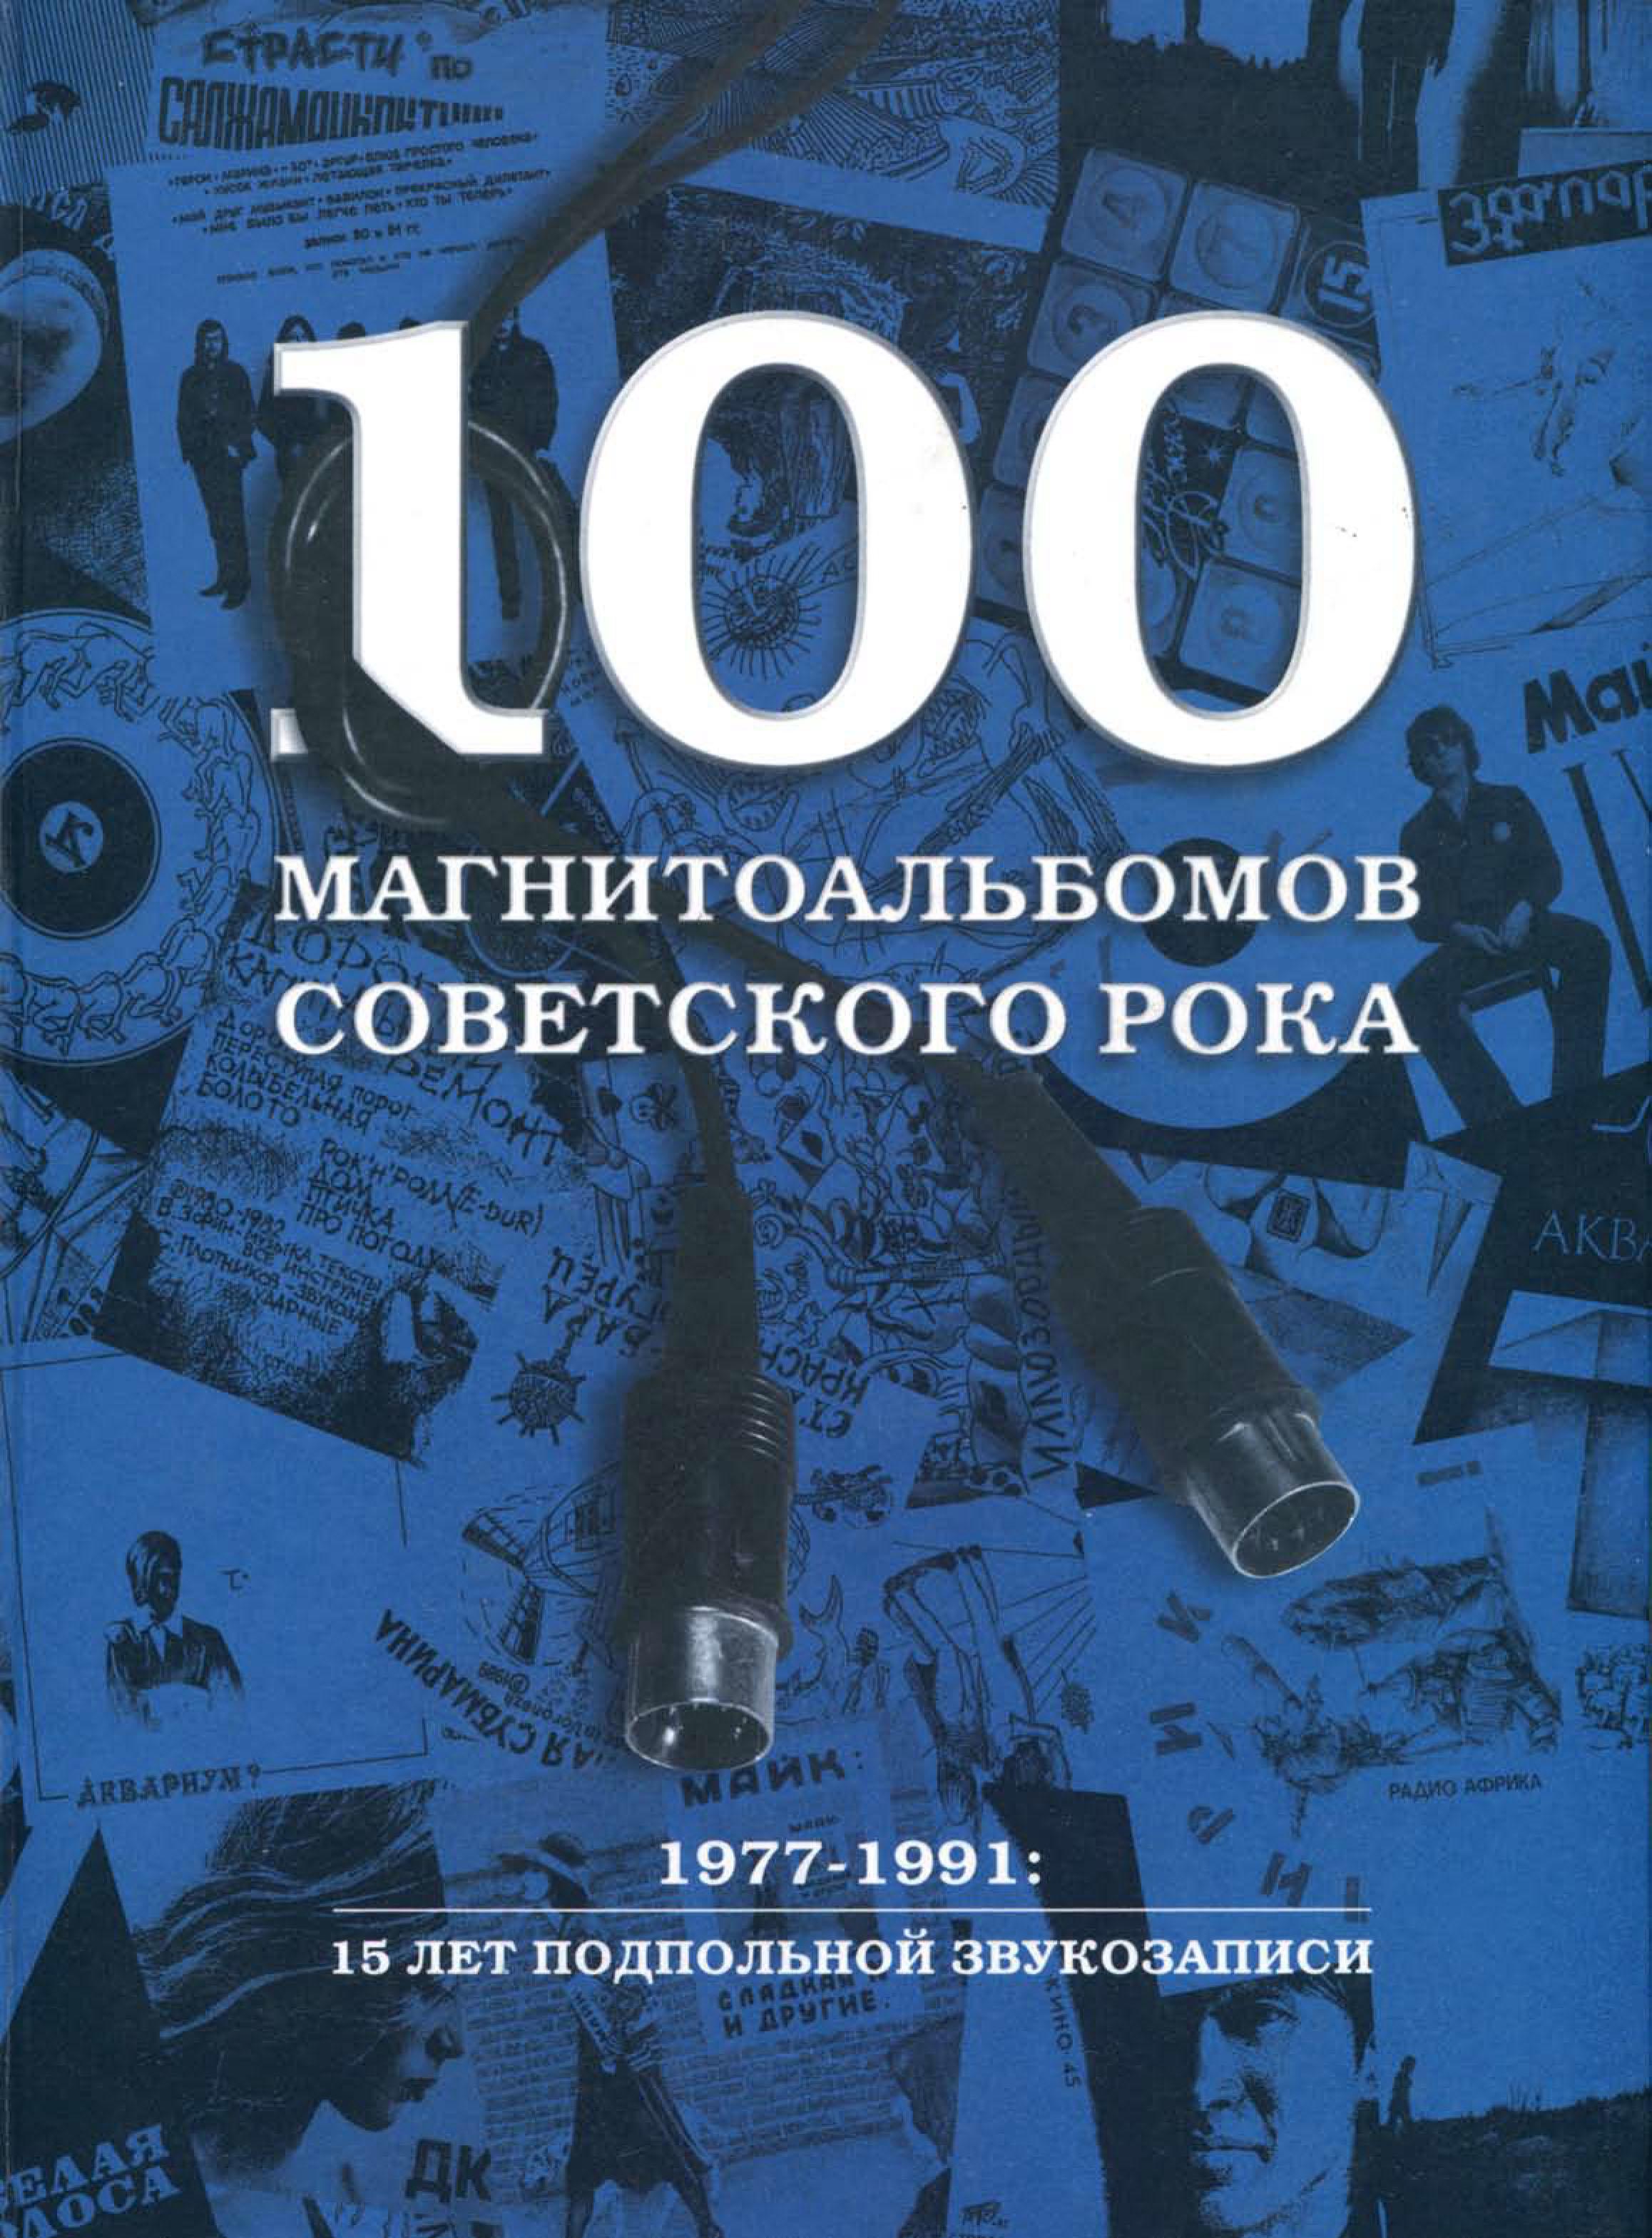 100masr_1999_000